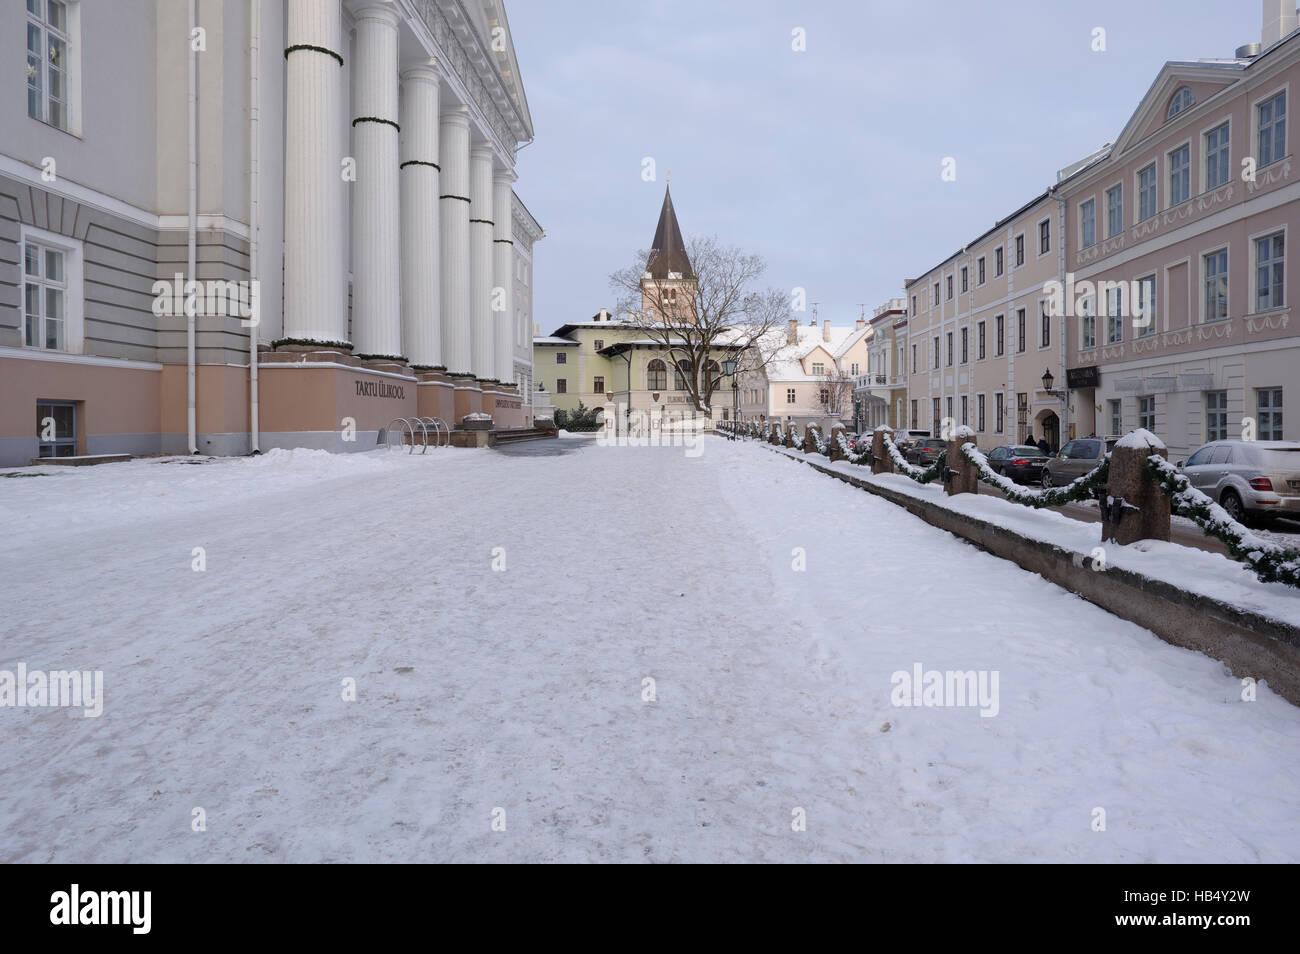 In front of the University of Tartu. Estonia 3th detsember 2016 - Stock Image